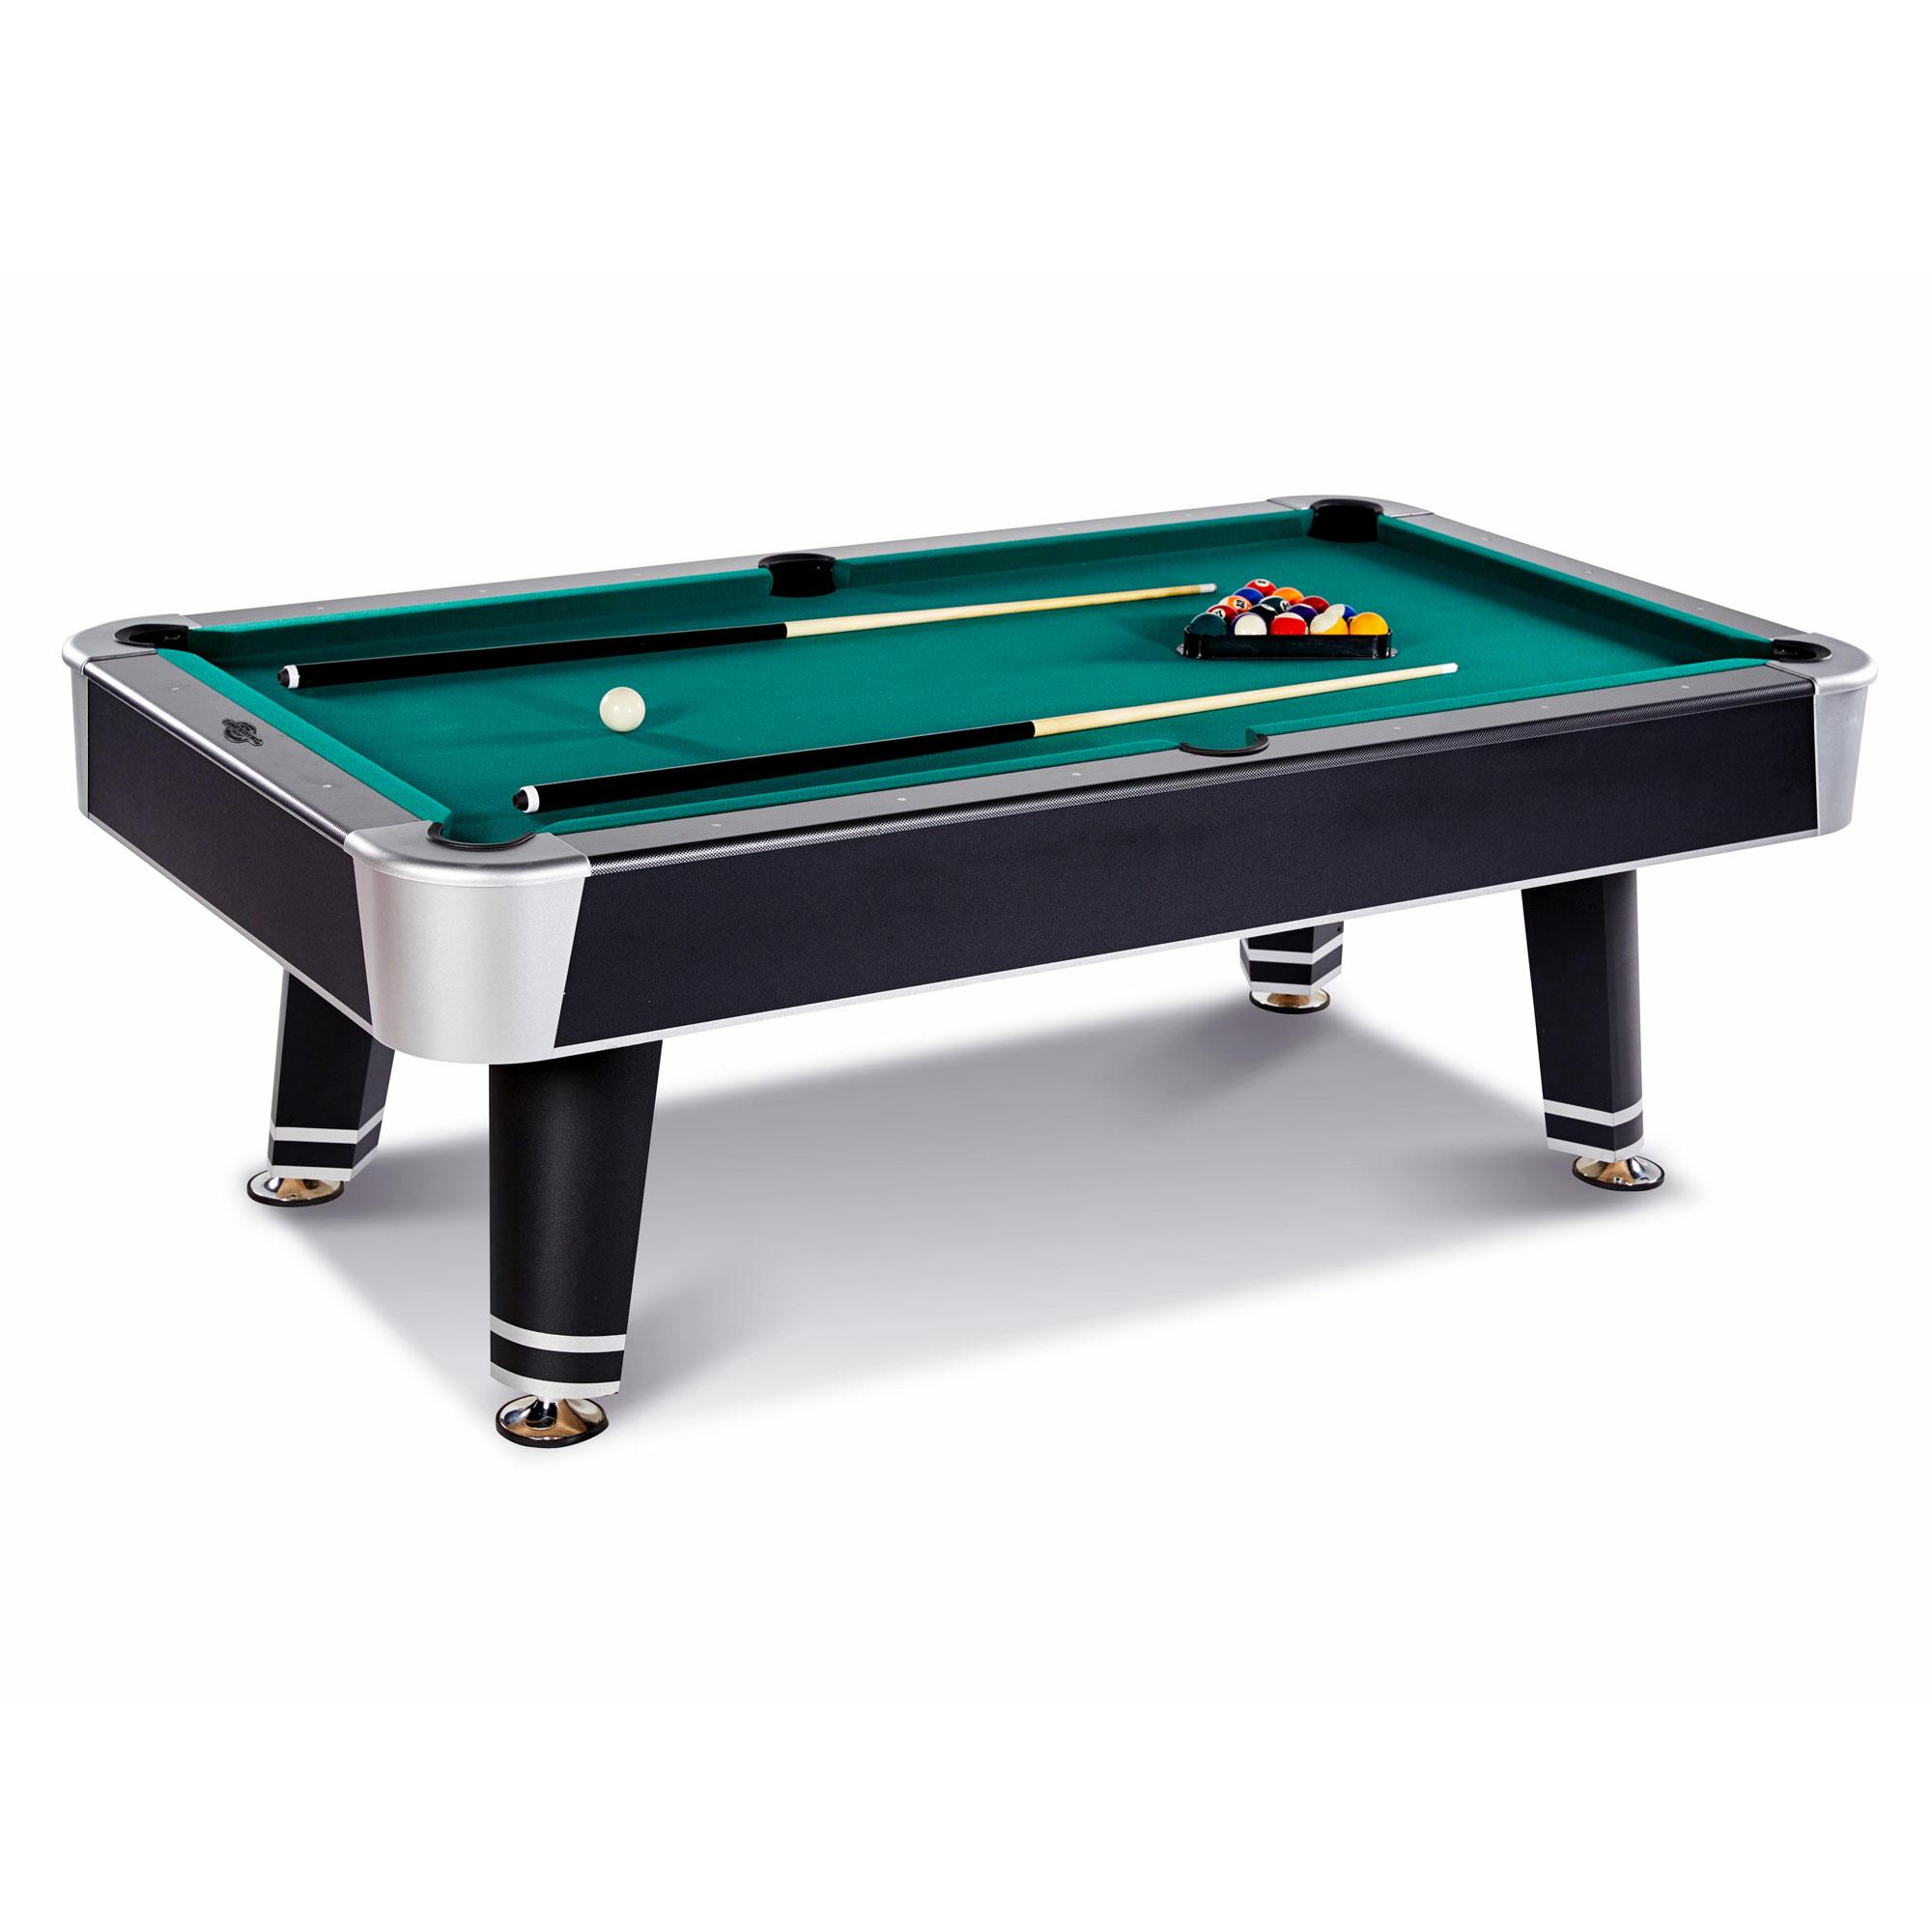 lancaster 90 inch arcade billiard table with k 66 bumper